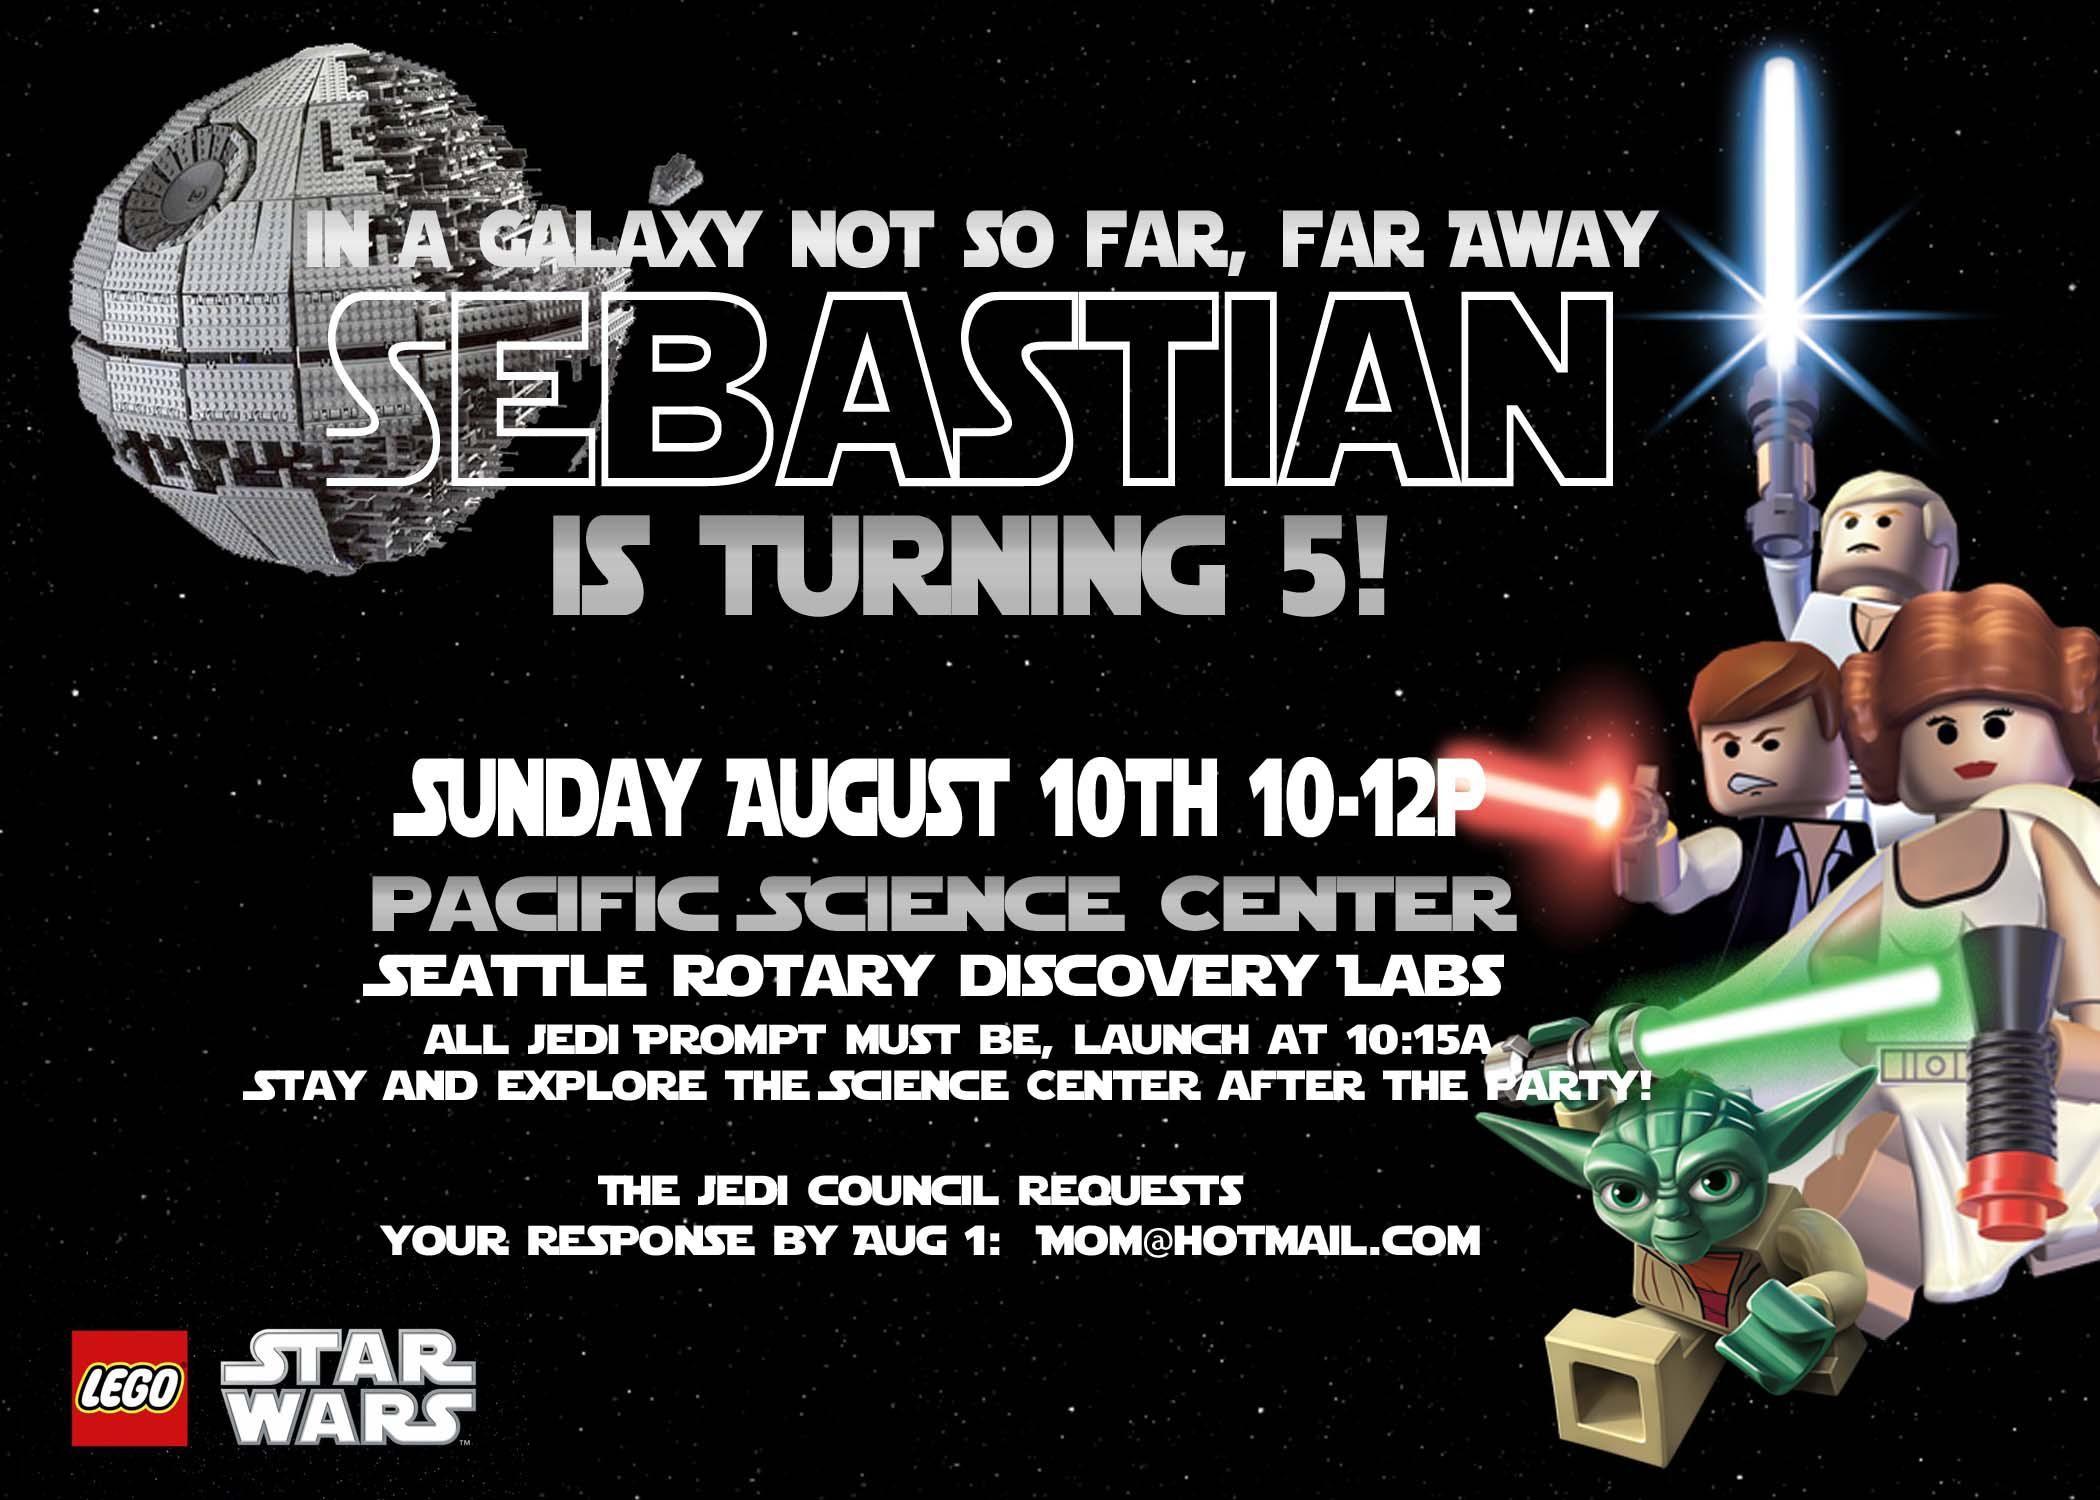 Star Wars Party Invitations Free Printable | Geburtstag | Pinterest ...